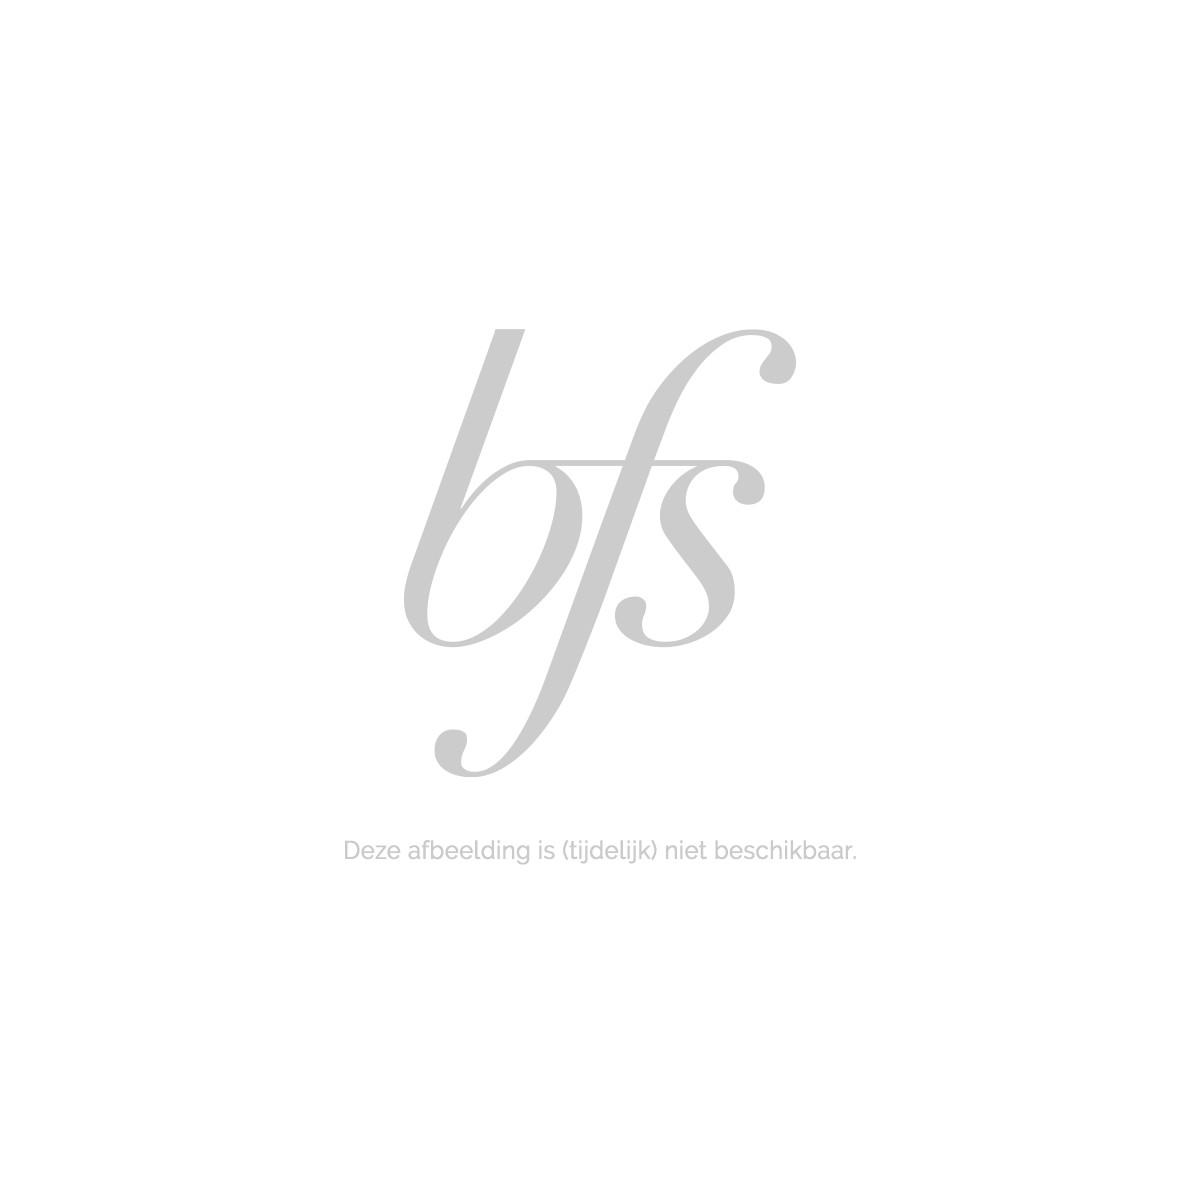 beMineral Bebeautiful Lips-Kit Baby